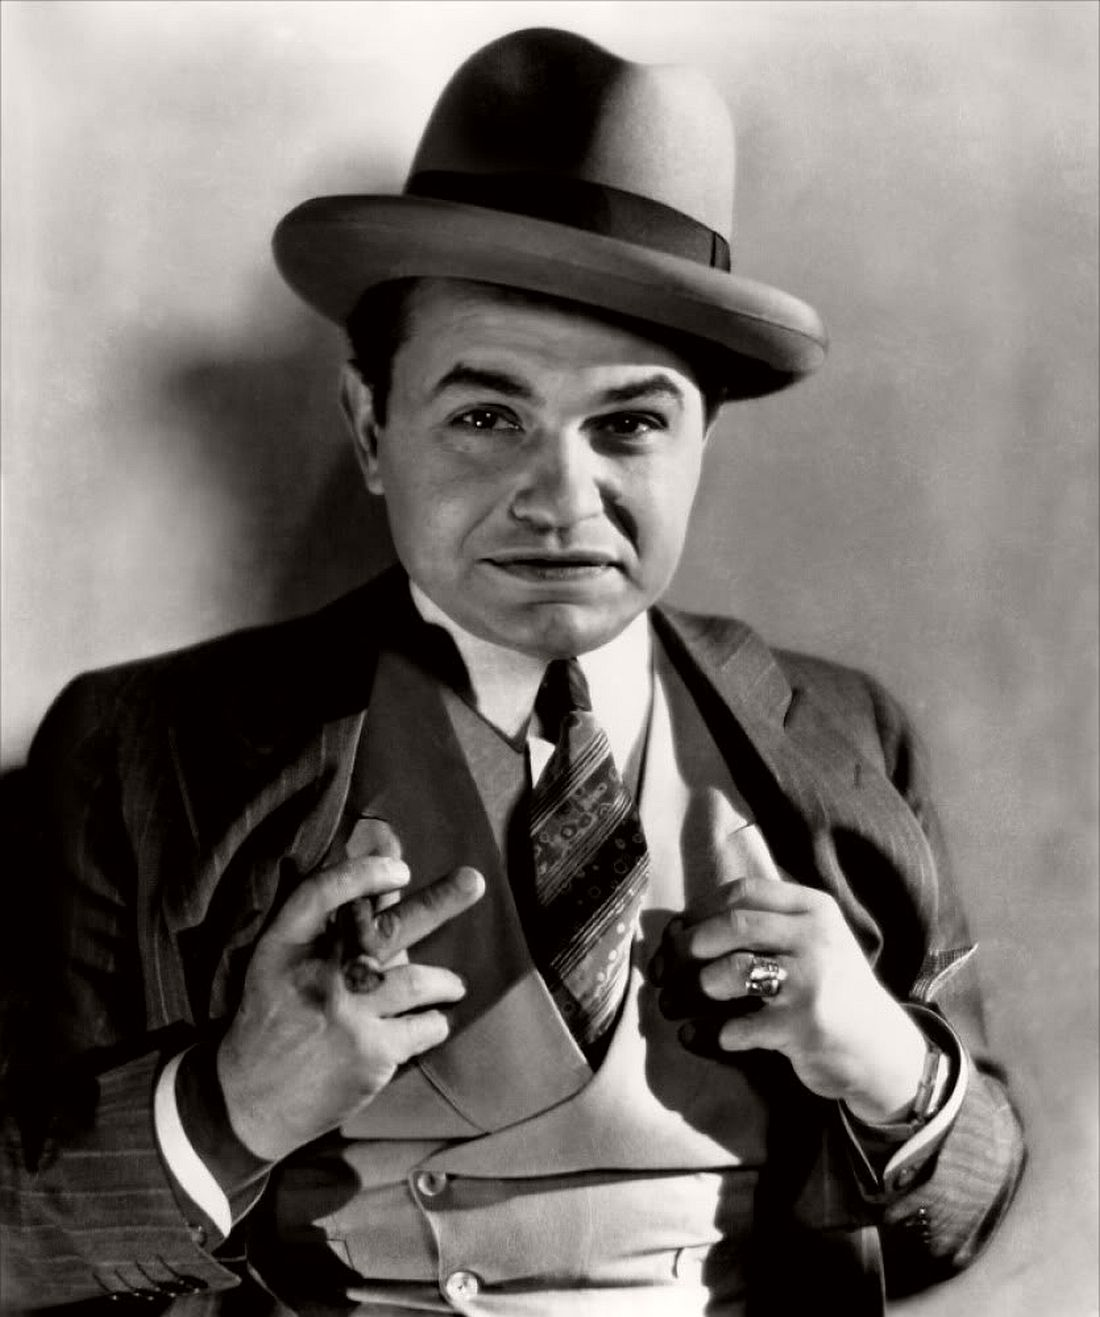 ttle-caesar-1931-behind-the-scenes-making-film-01